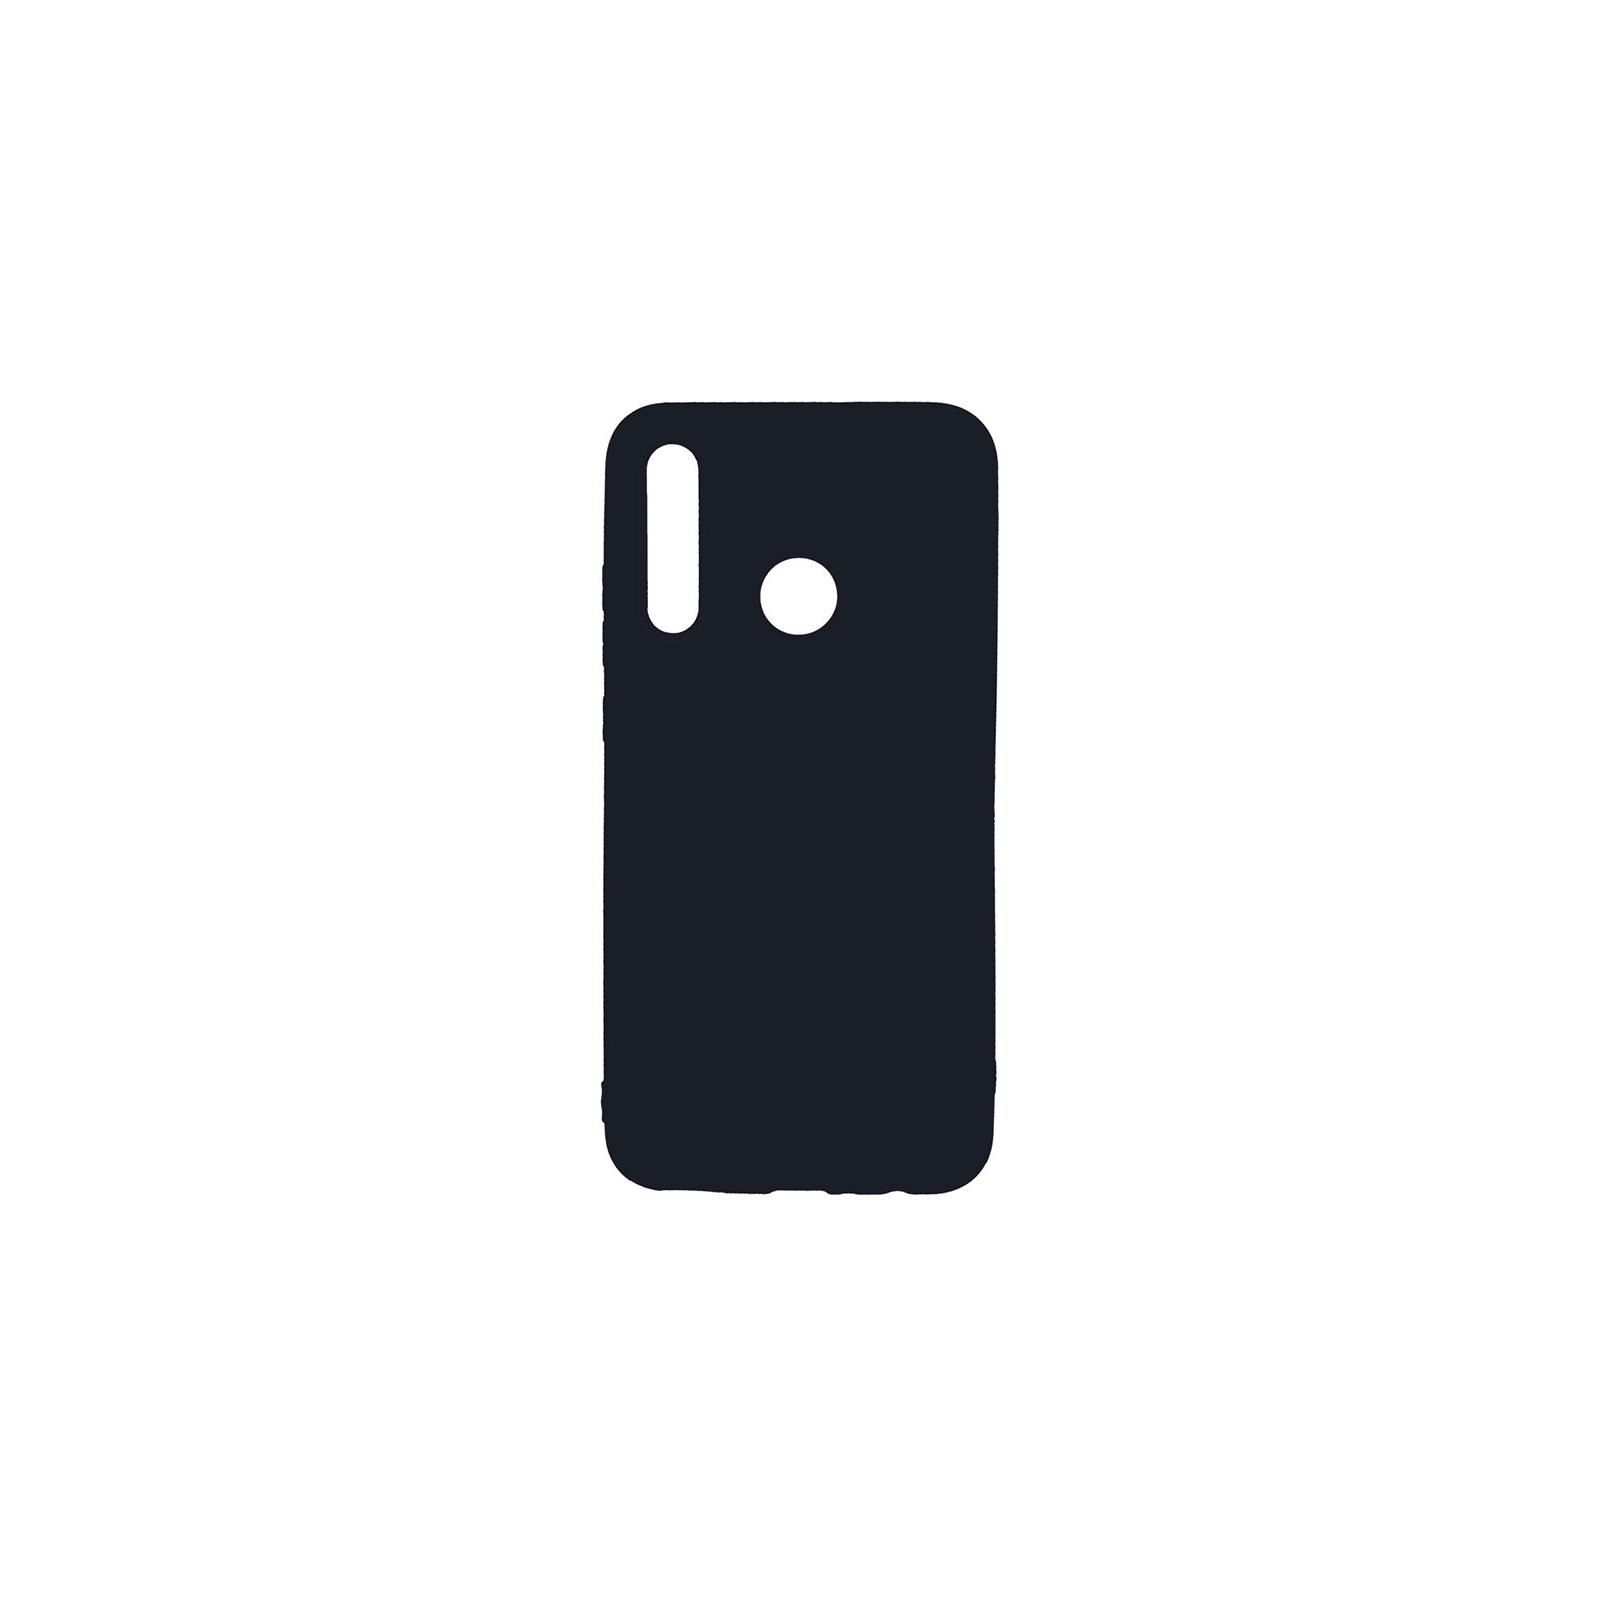 Чехол для моб. телефона Toto 1mm Matt TPU Case Huawei P Smart 2019 Black (F_93941)